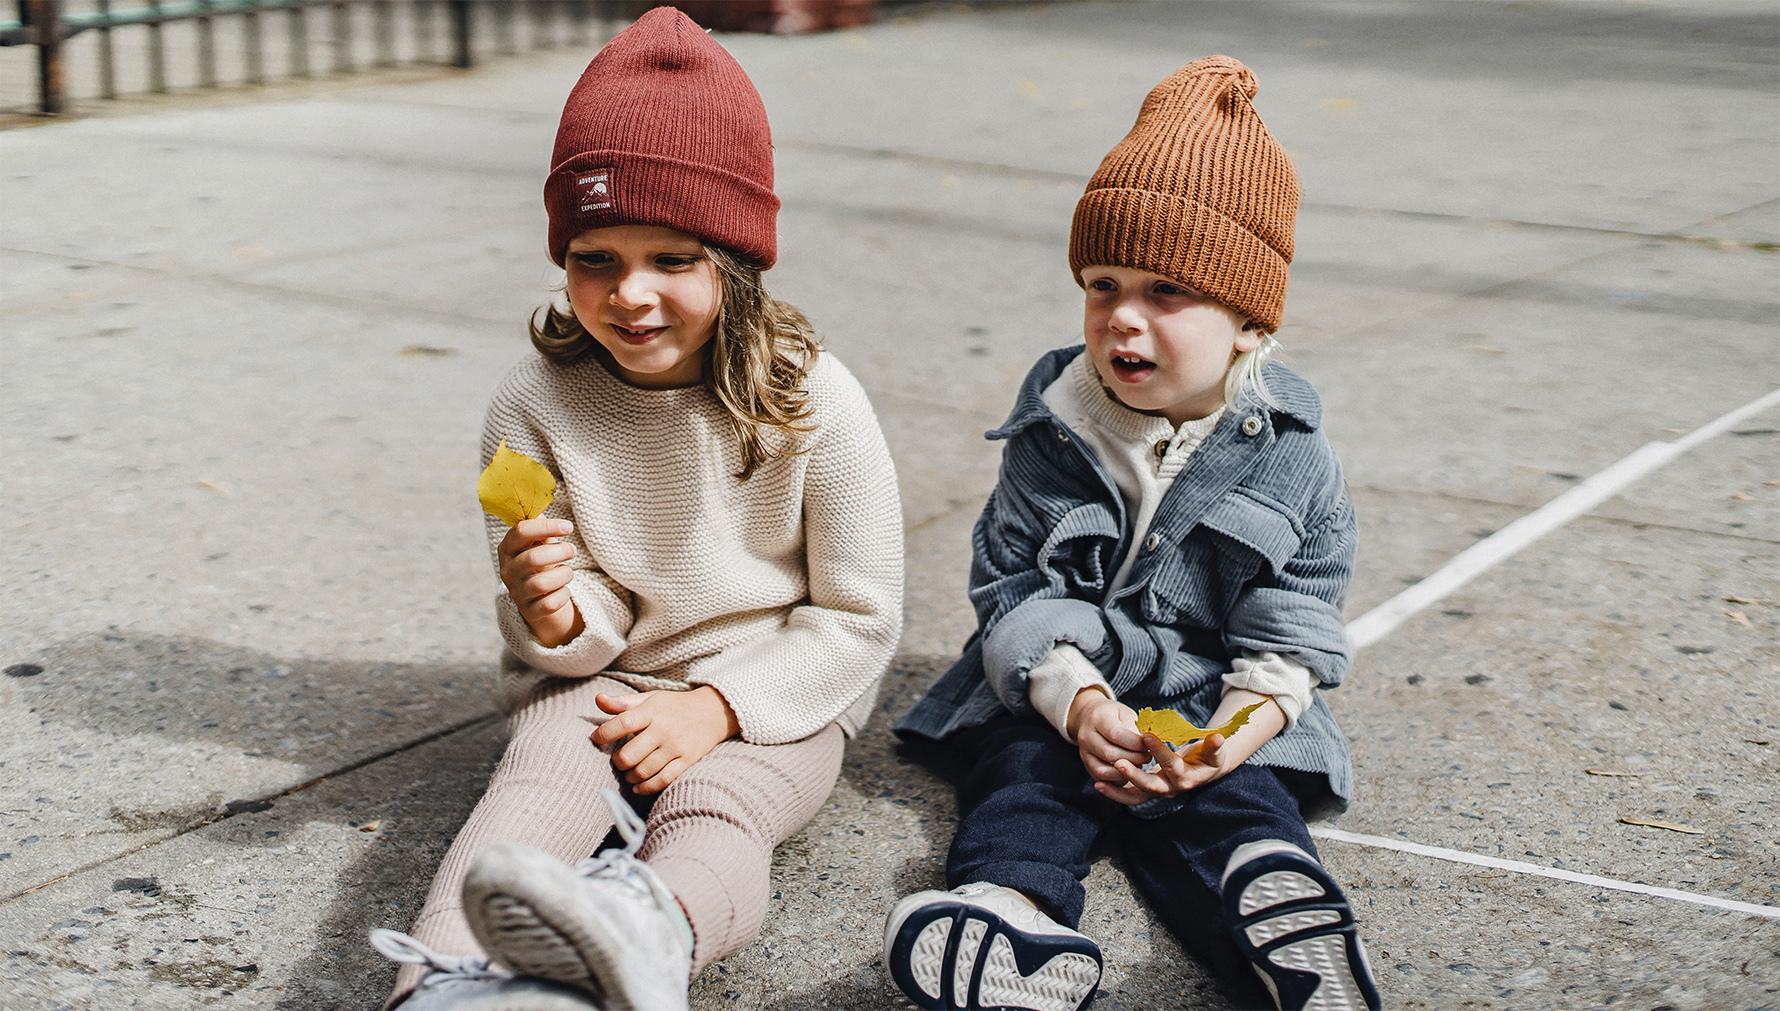 Odporność dzieci / pexels